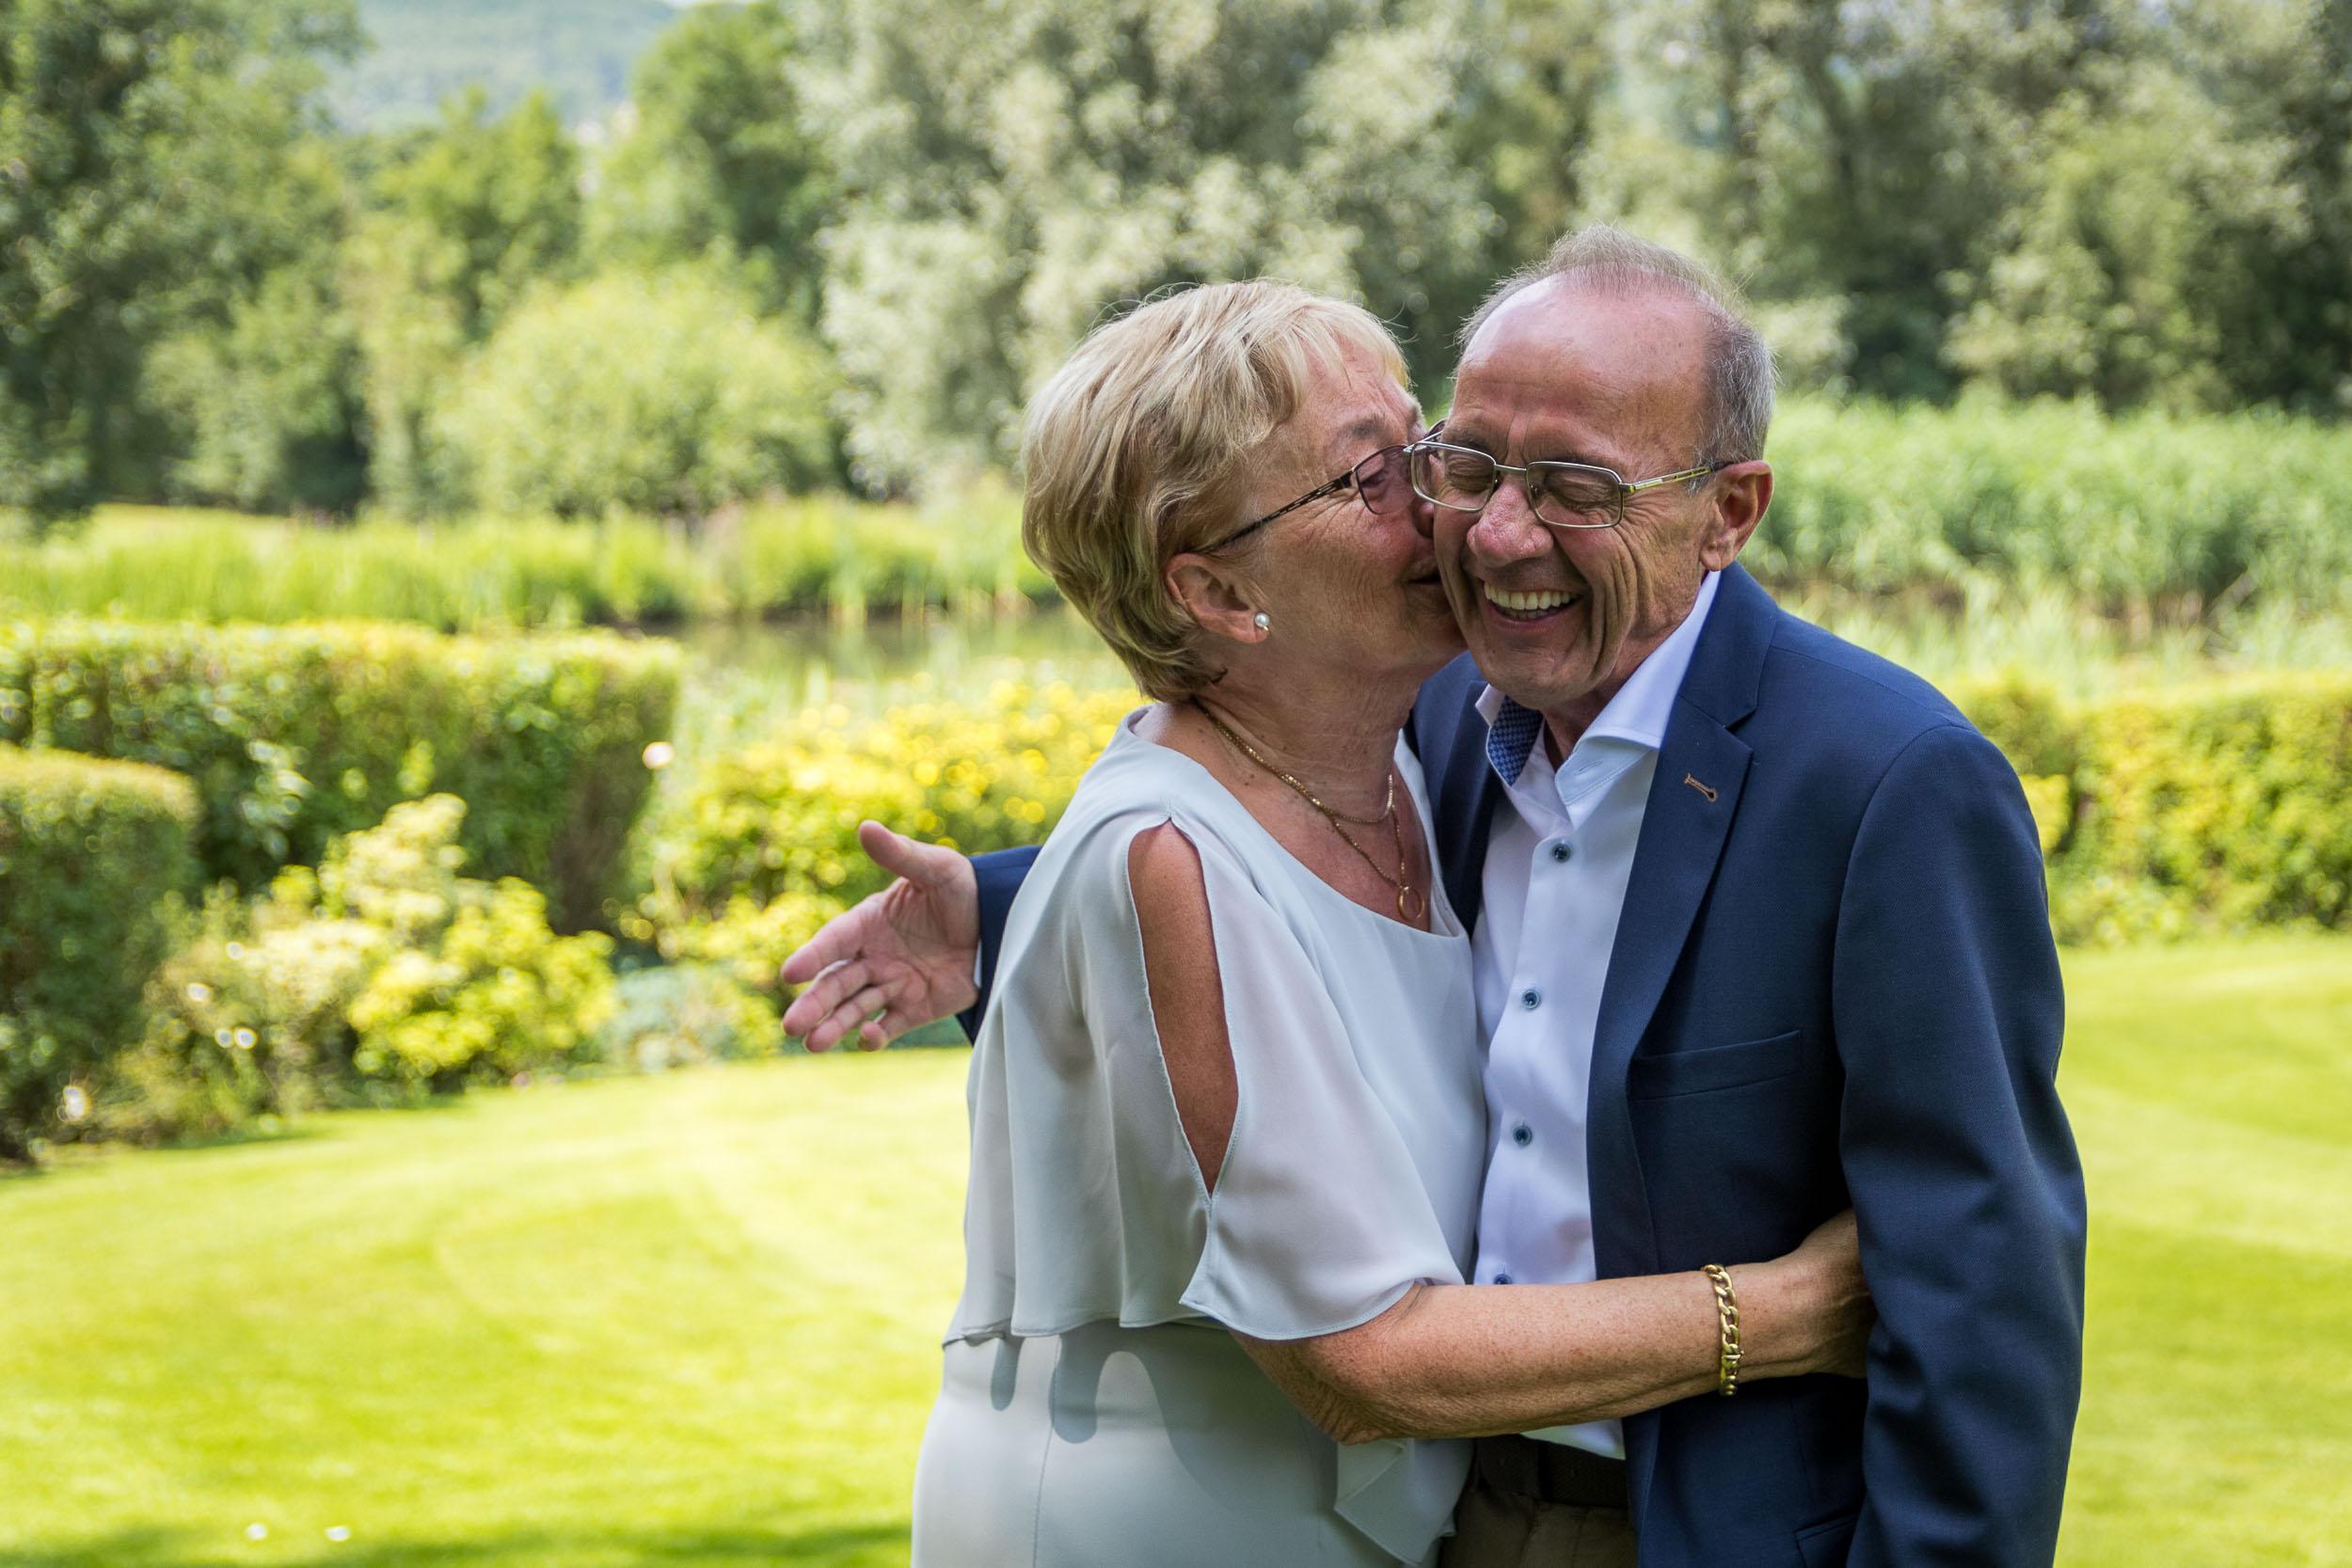 Wedding anniversary in Liège taken by a Brussels photographer